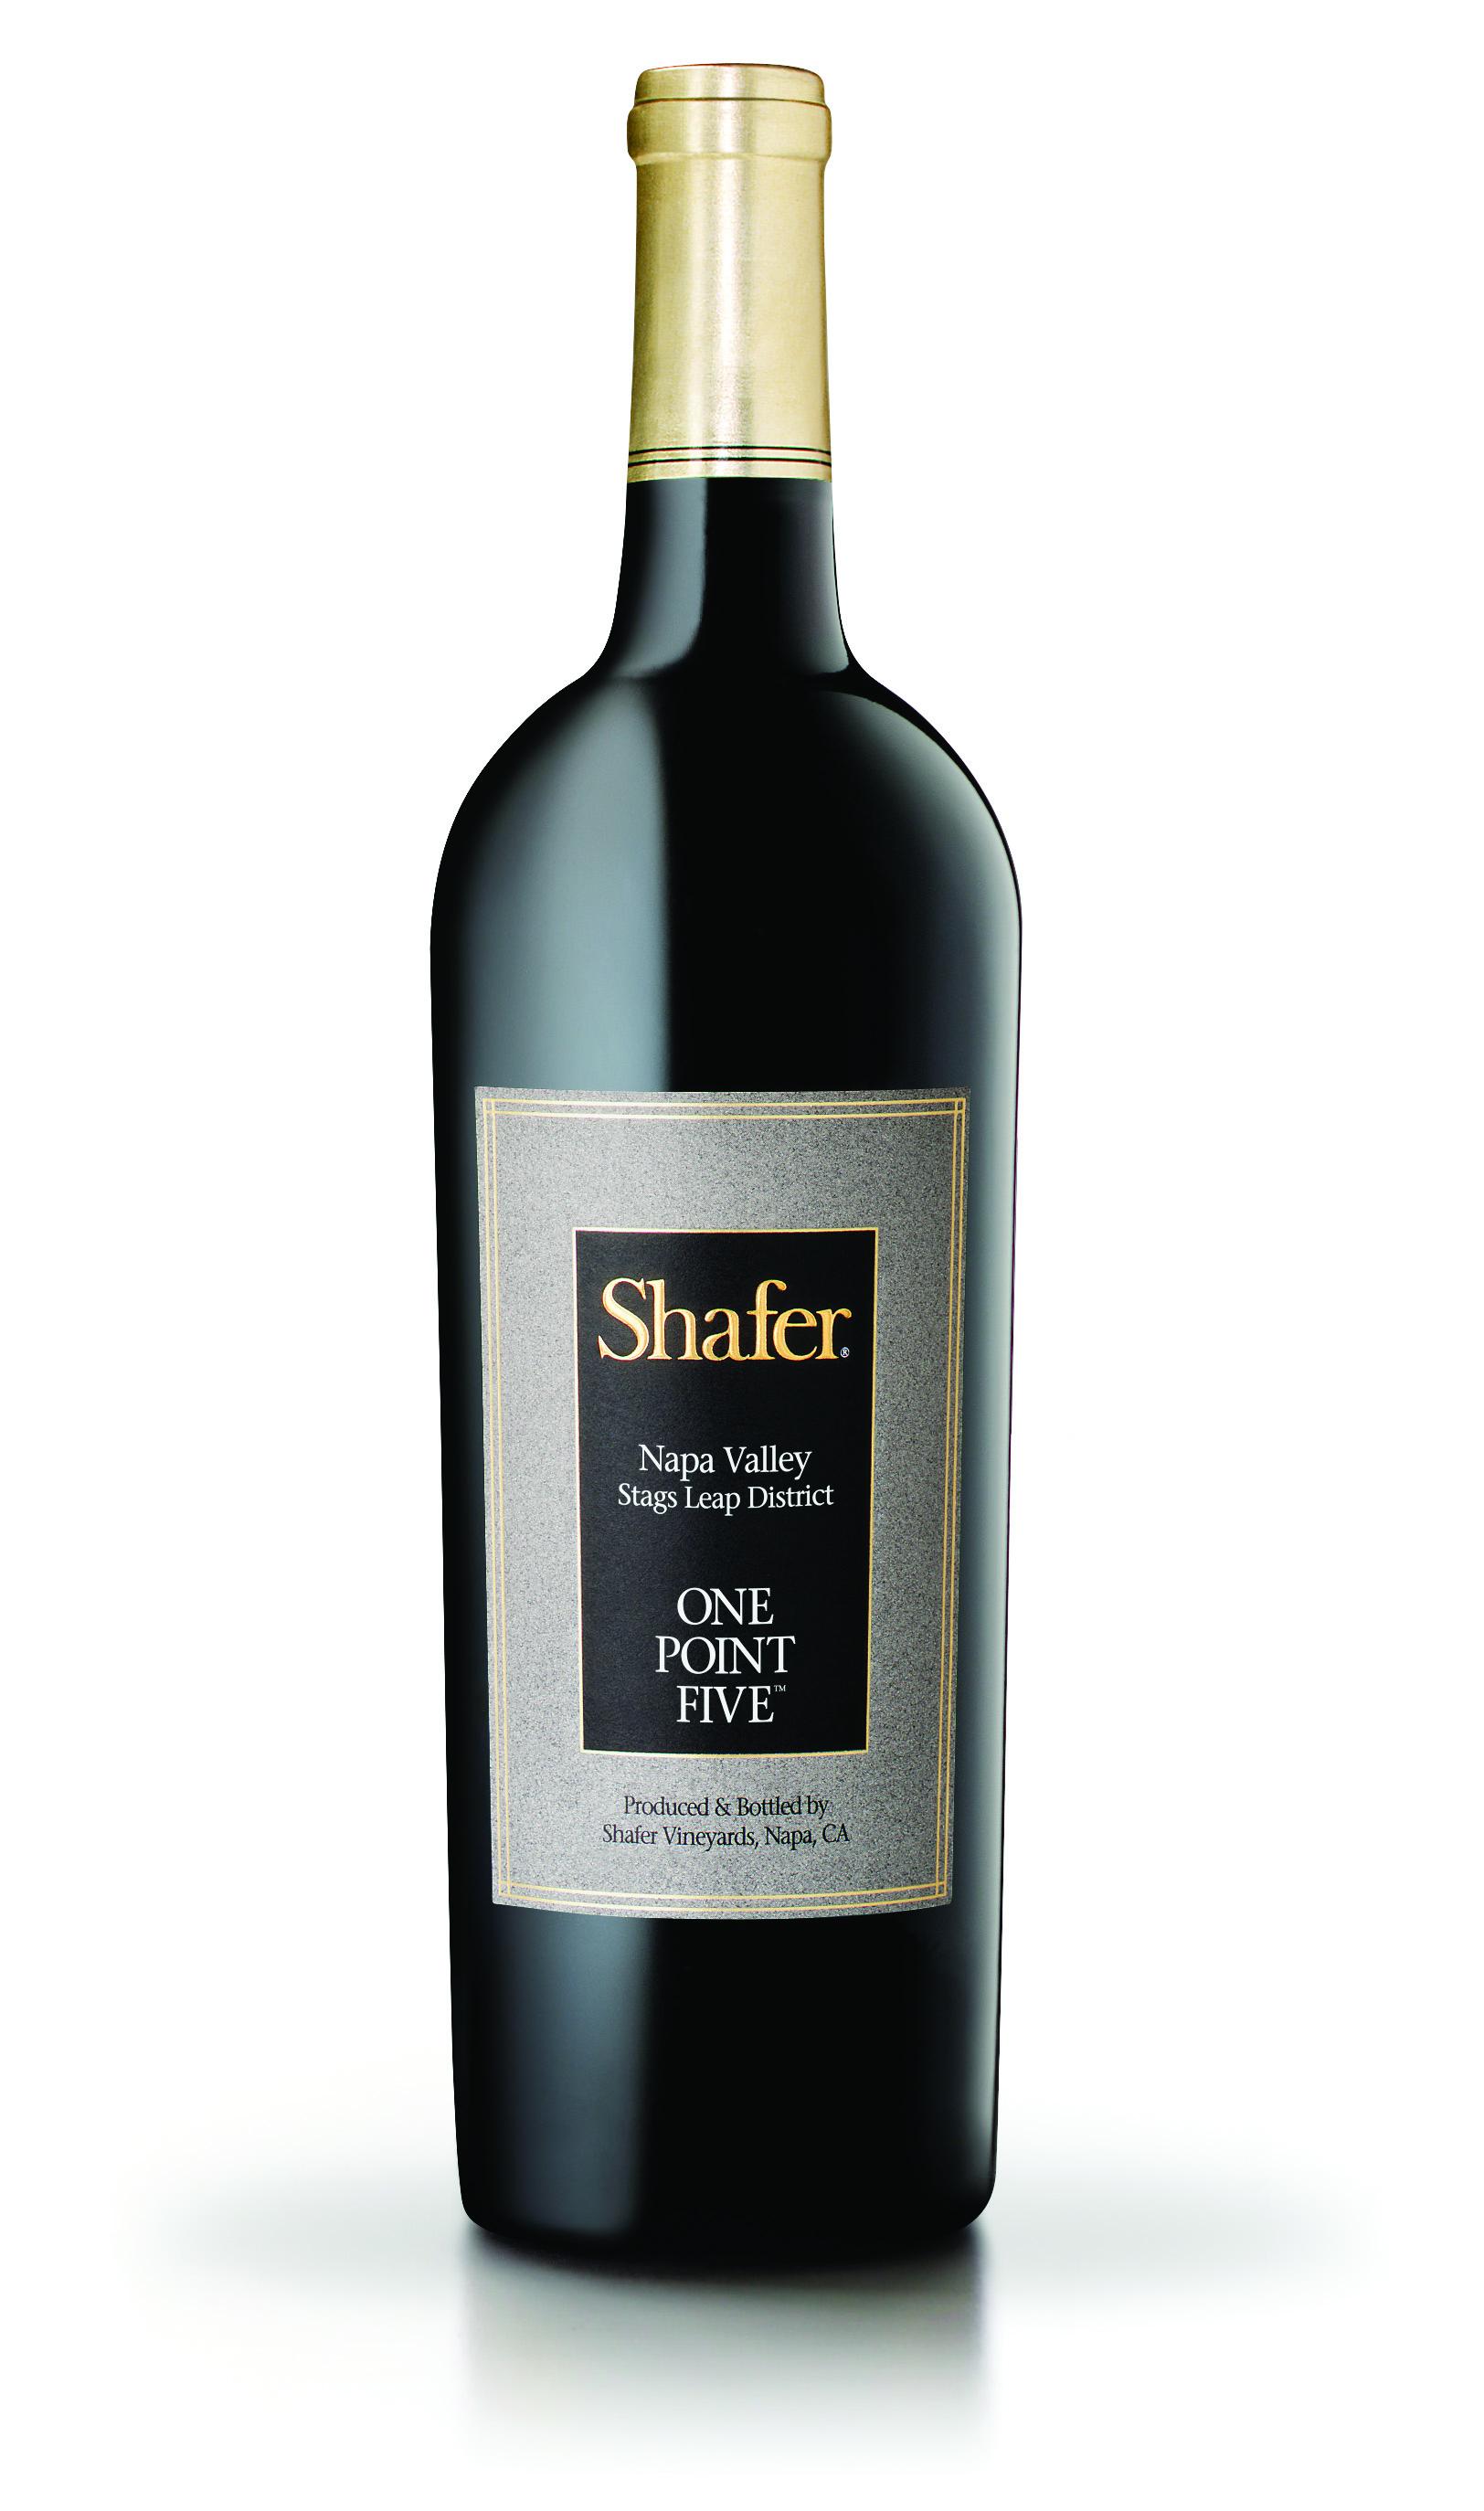 2003 Shafer Cabernet Sauvignon Napa Valley